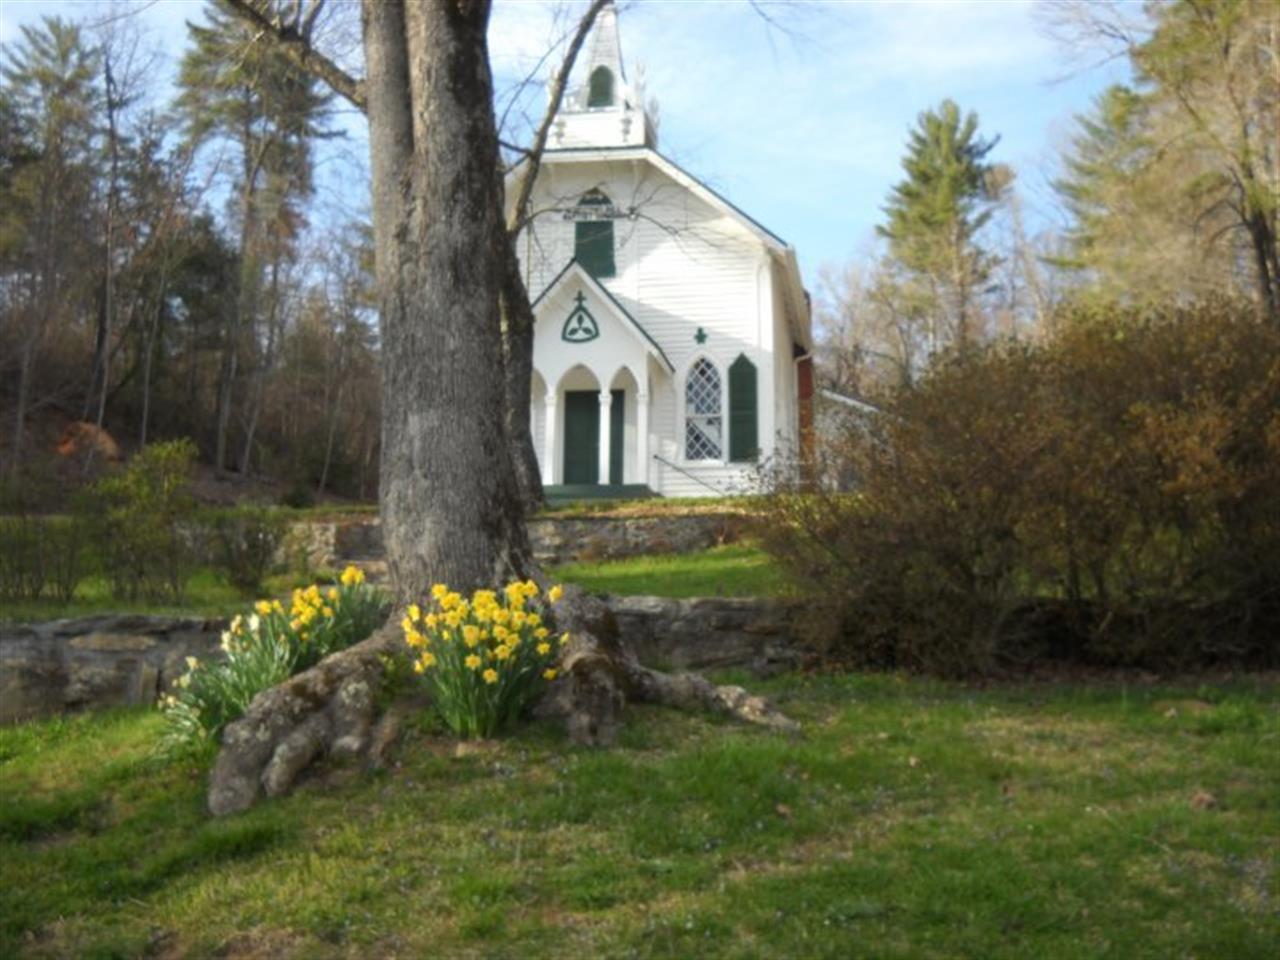 Spring at Crescent Hill Baptist Church in Sautee Nacoochee, Georgia (Helen, GA)